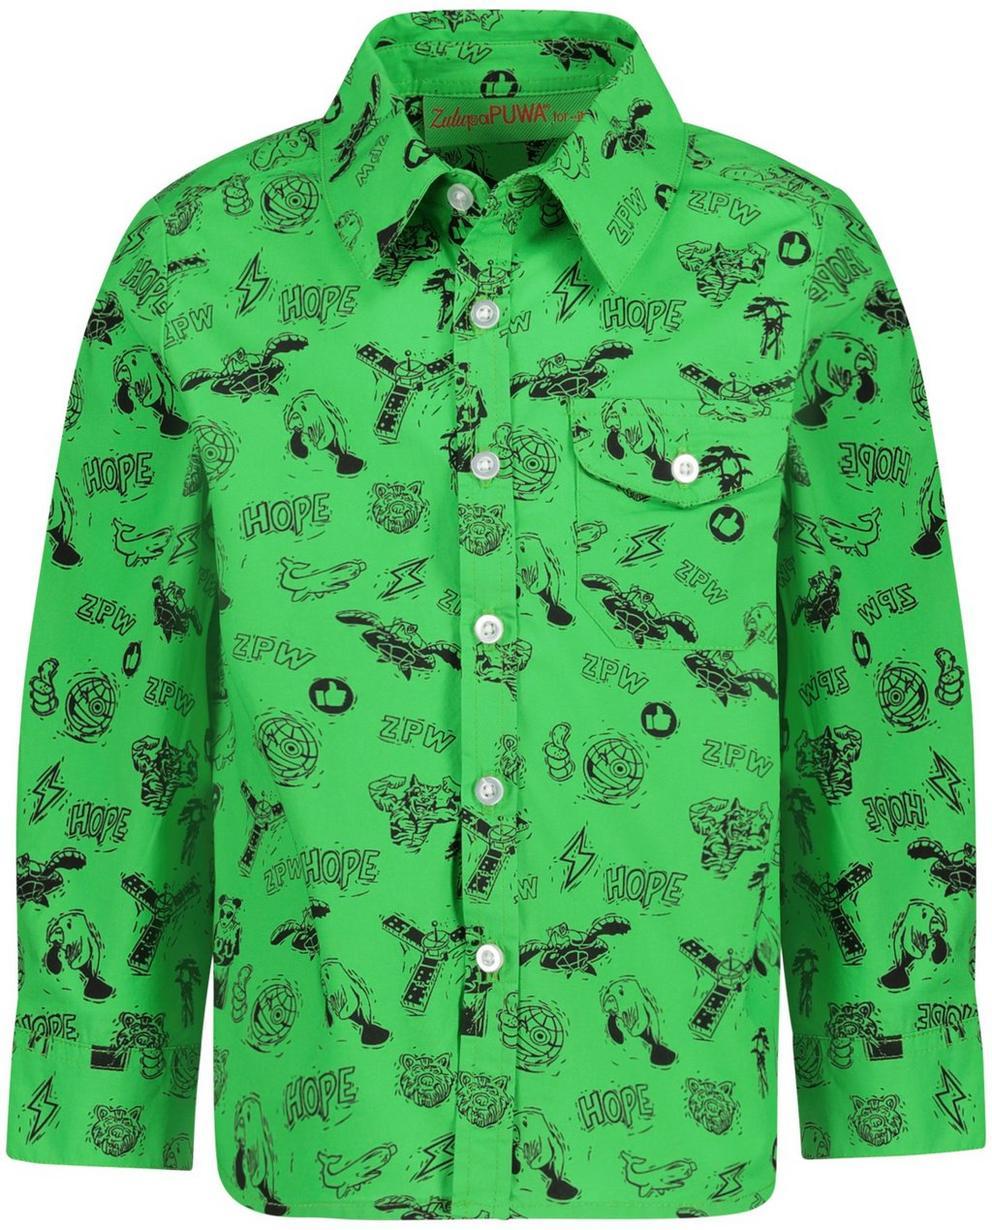 Hemden - GNF - Grasgroen hemd met print